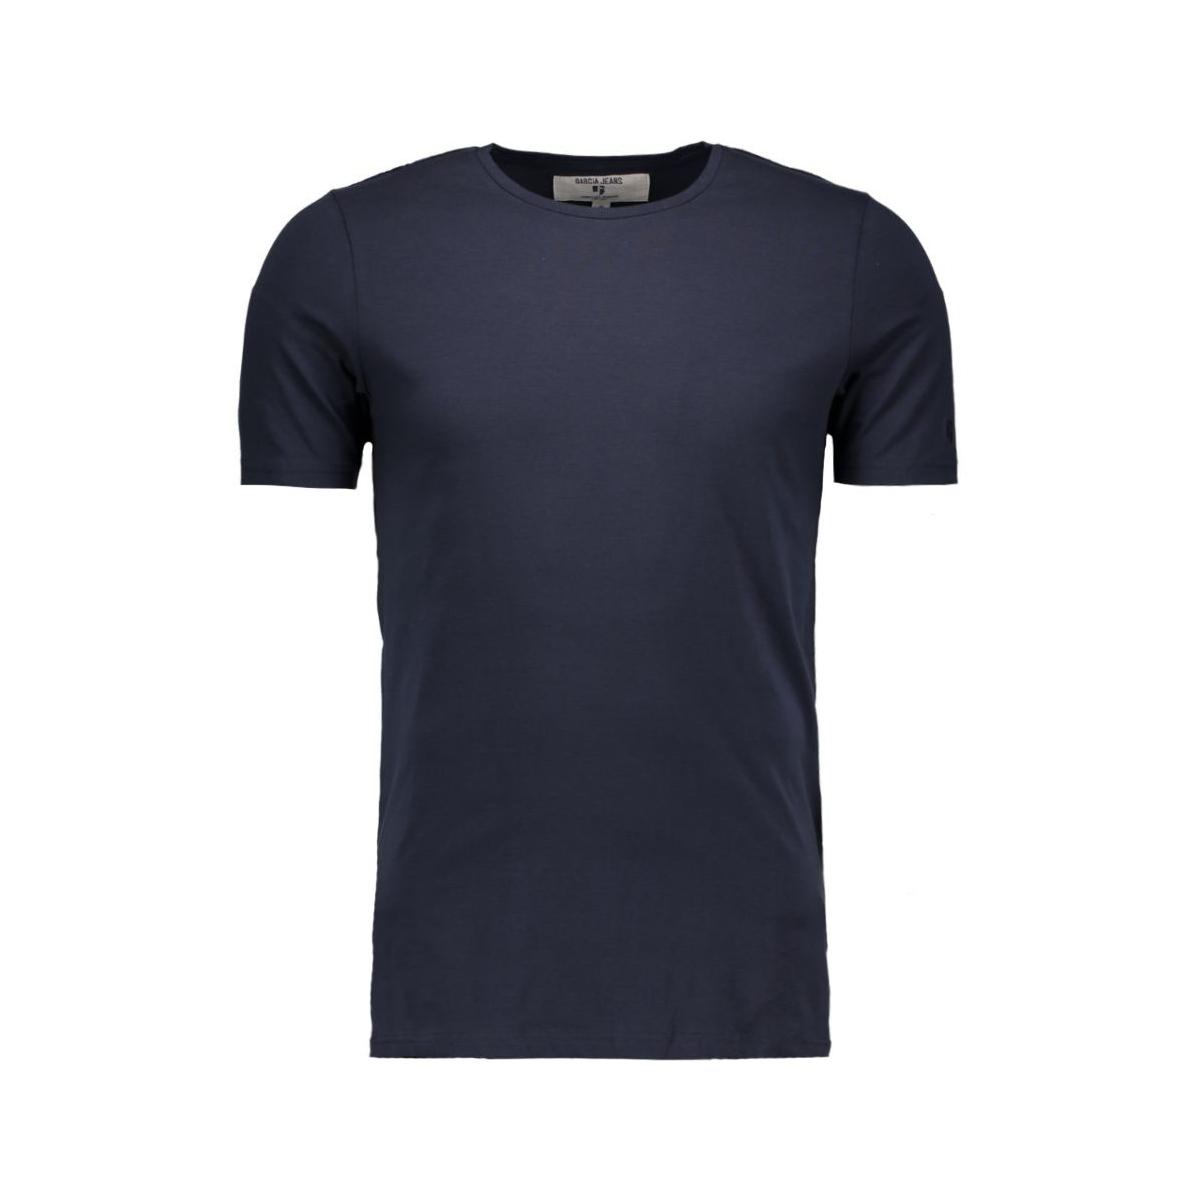 z1068 garcia t-shirt 292 dark moon